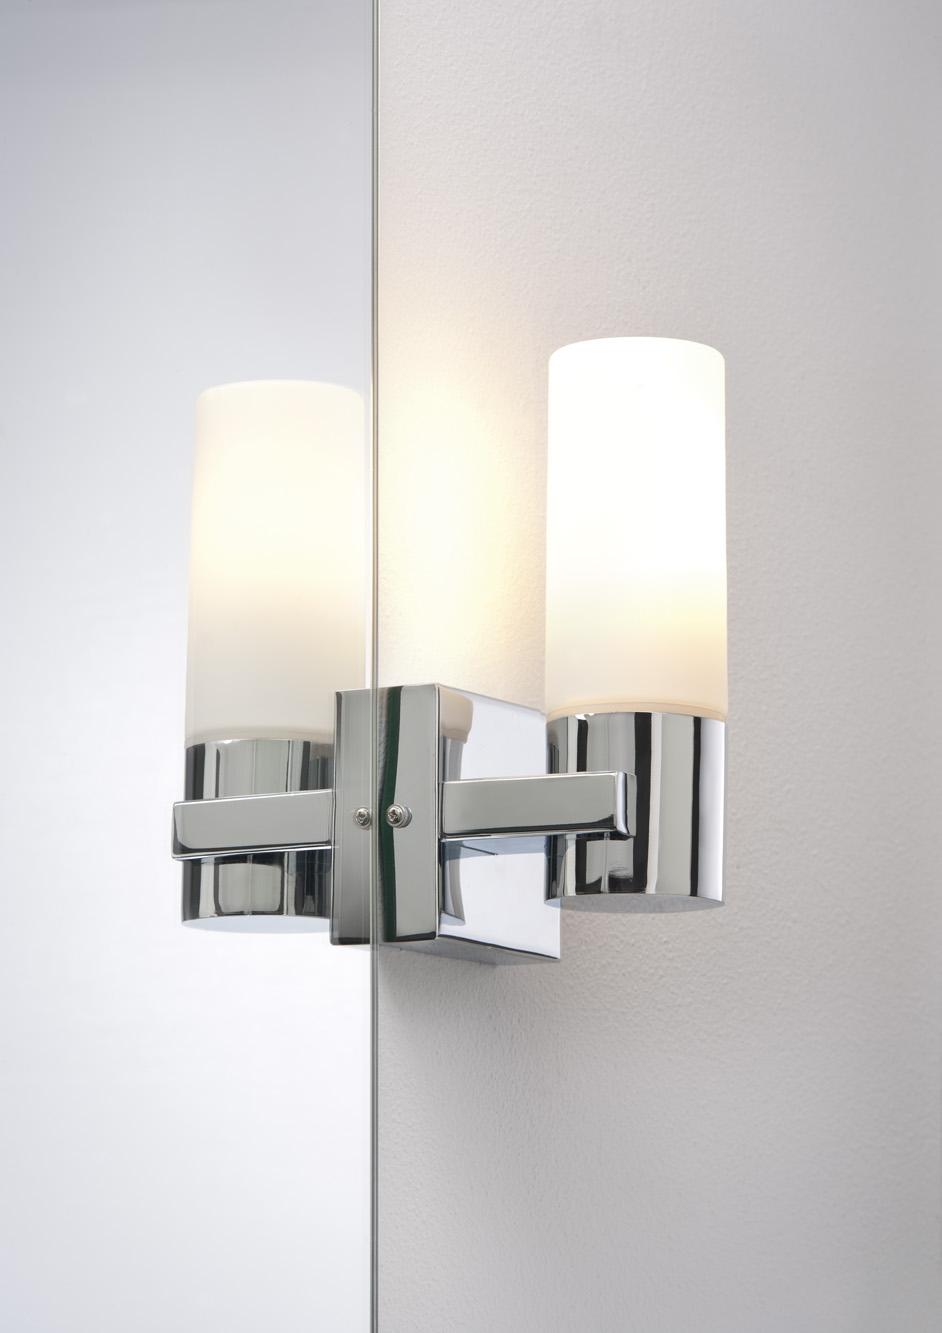 Kit 2 appliques salle de bain paulmann gemini ip44 max 40w - Applique salle de bain ip44 ...